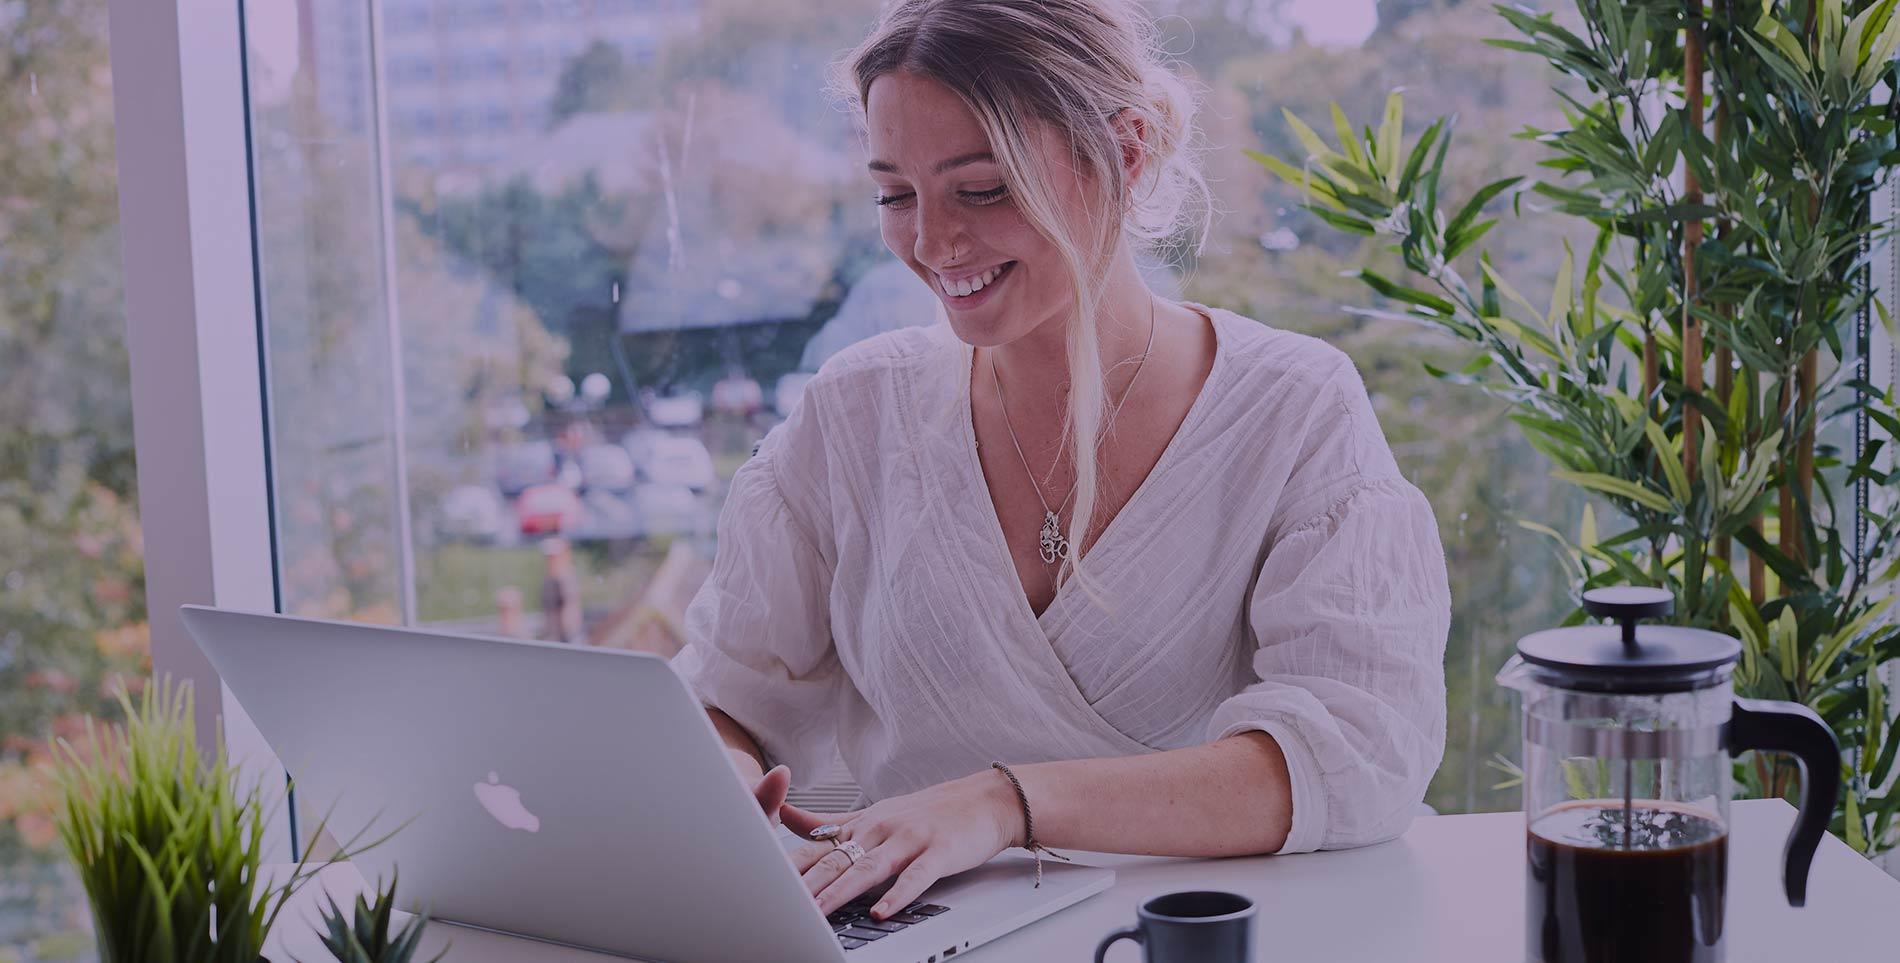 Nology | Hire a Developer